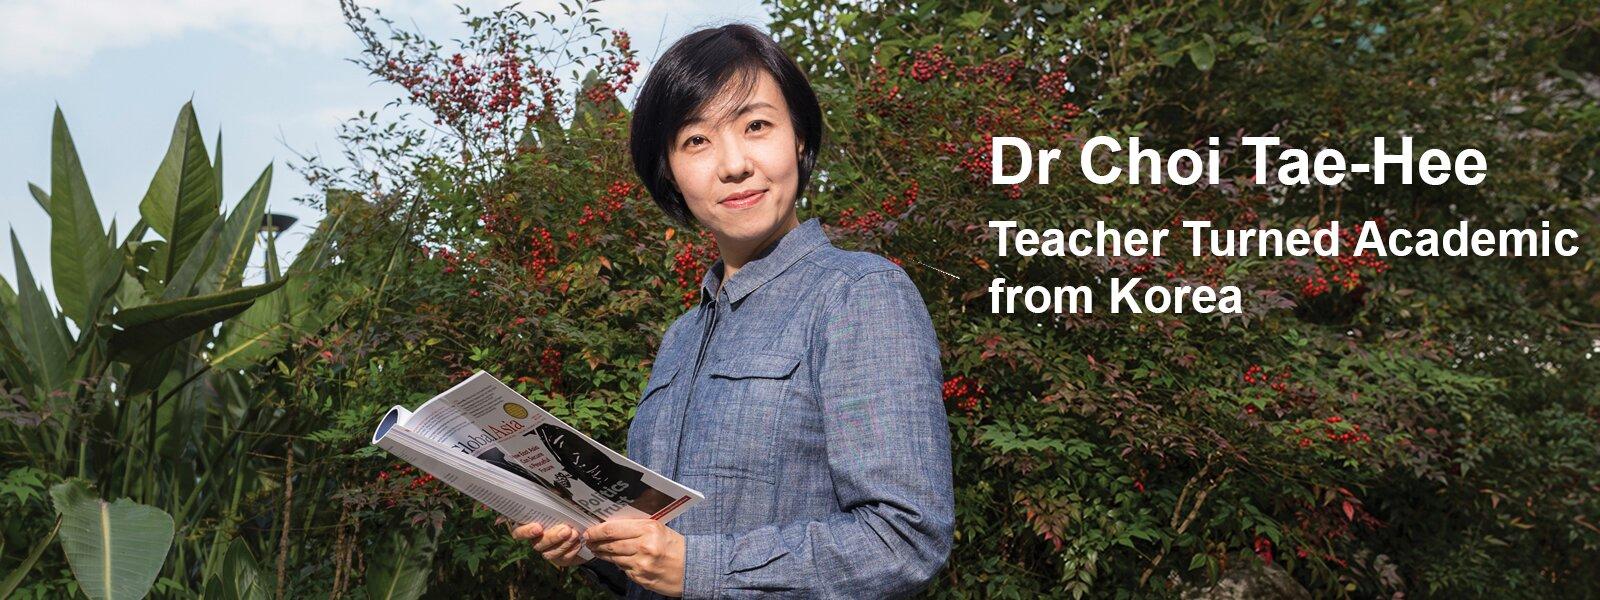 Dr Choi Tae-Hee: Teacher Turned Academic from Korea